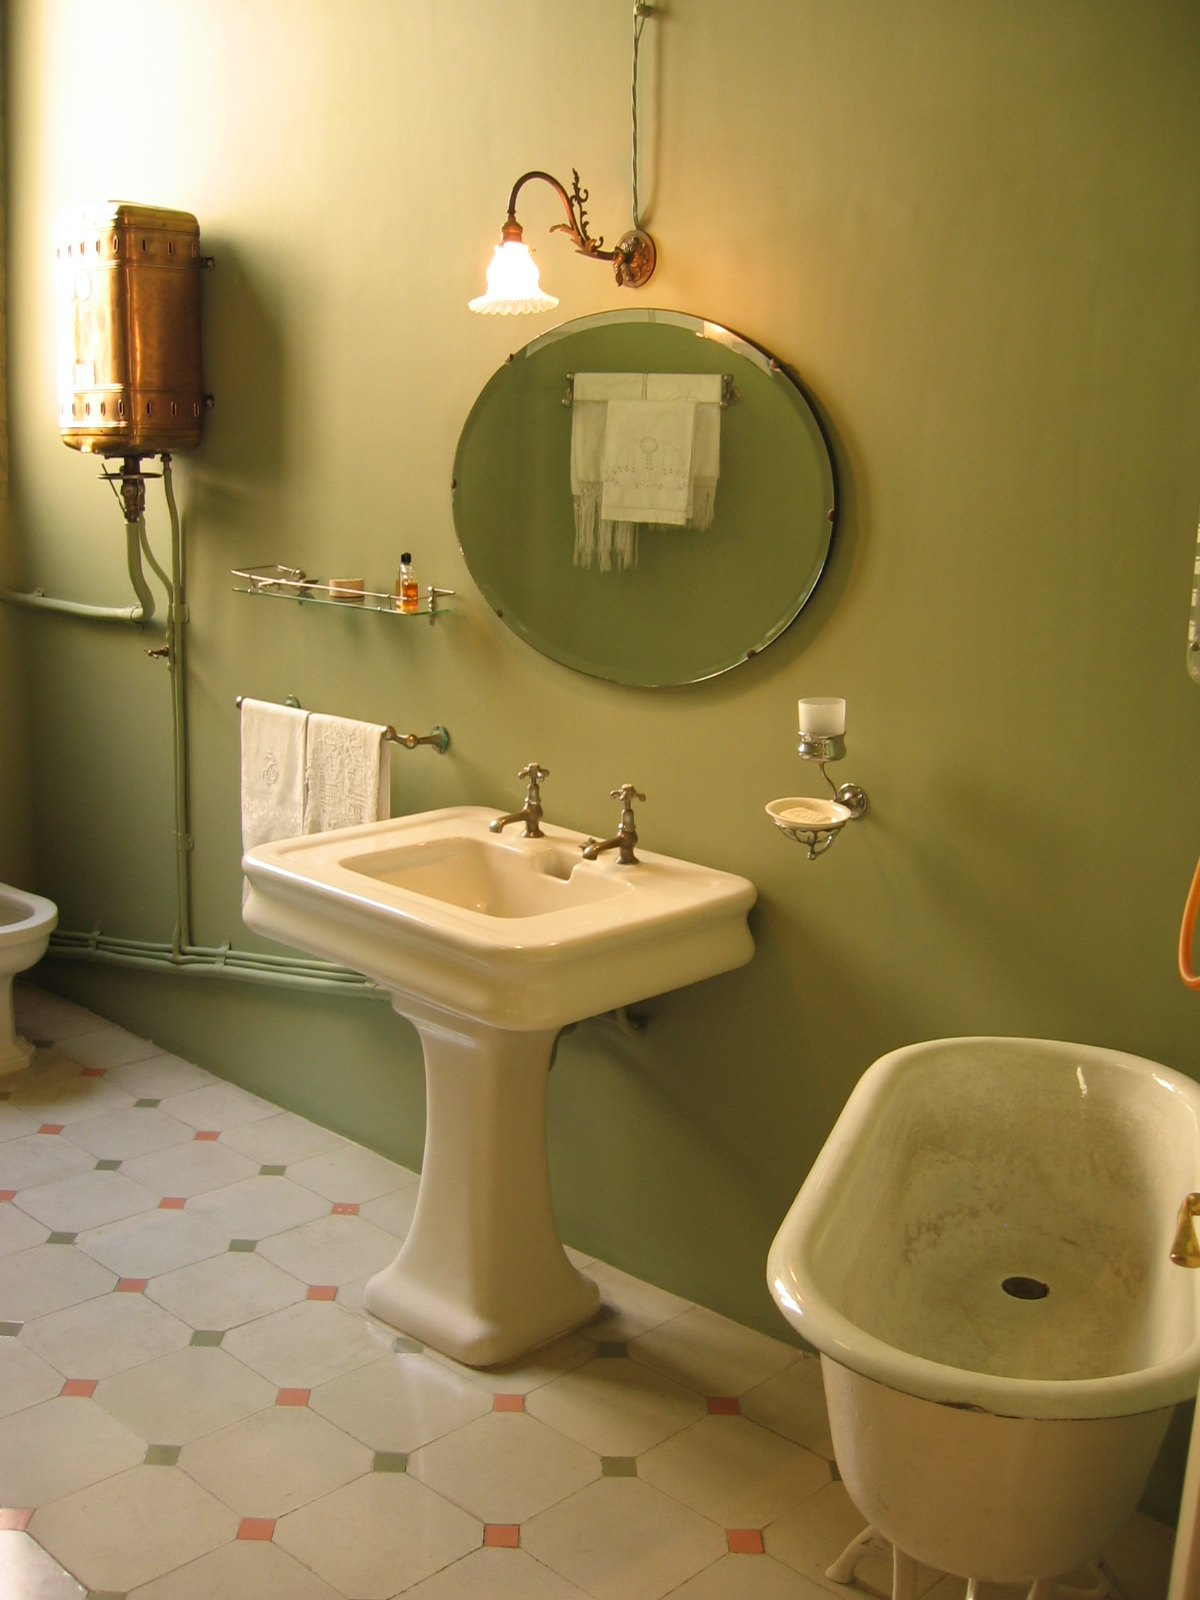 Decoracion De Baños Modernos Pequenos:Small Bathroom Decorating Ideas